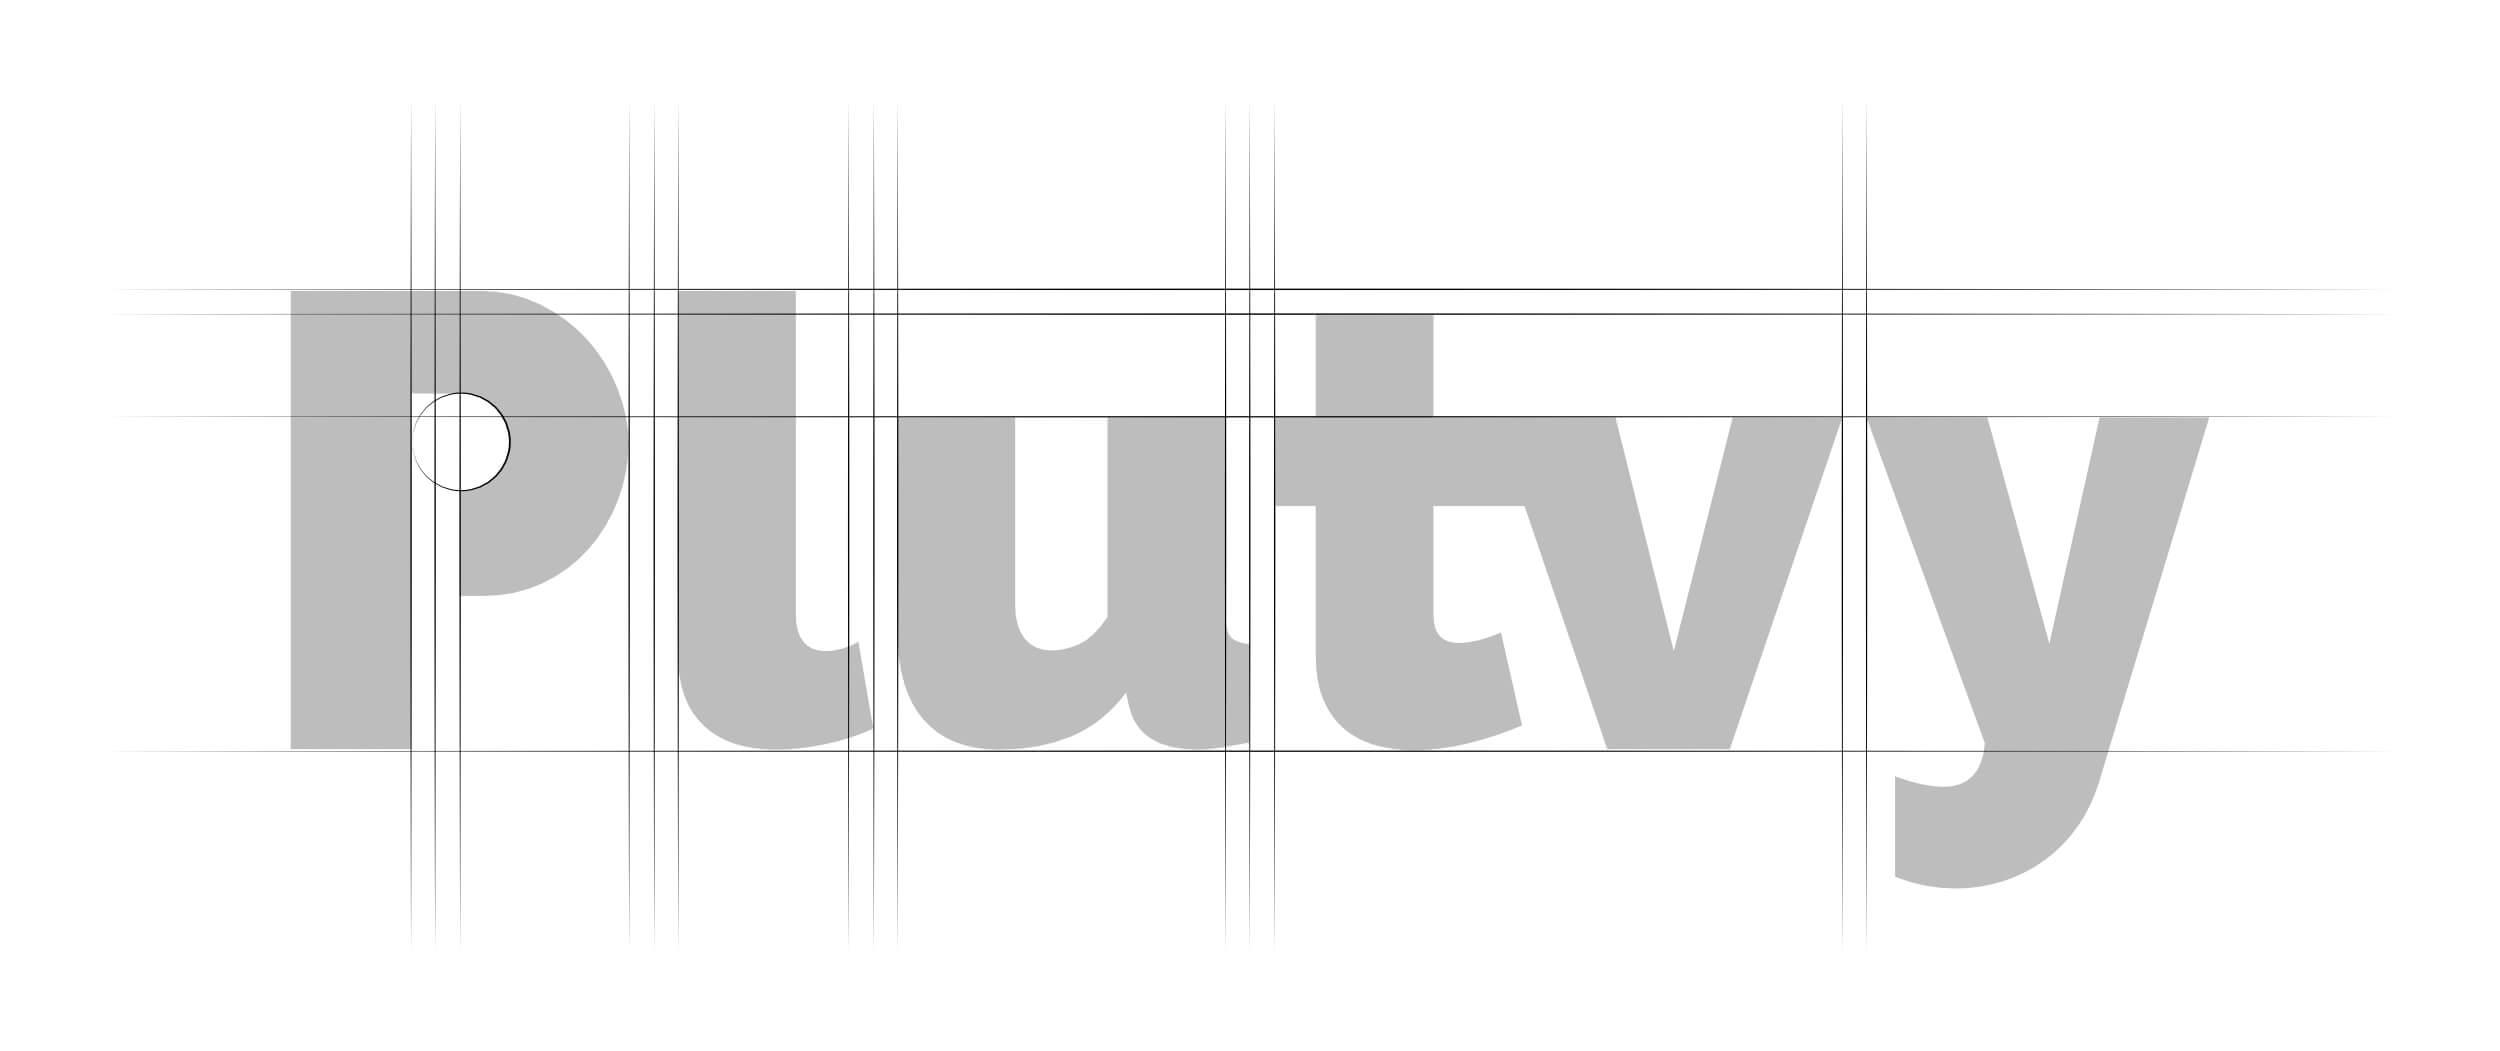 plutvy-sk logo branding by michael maleek djibril